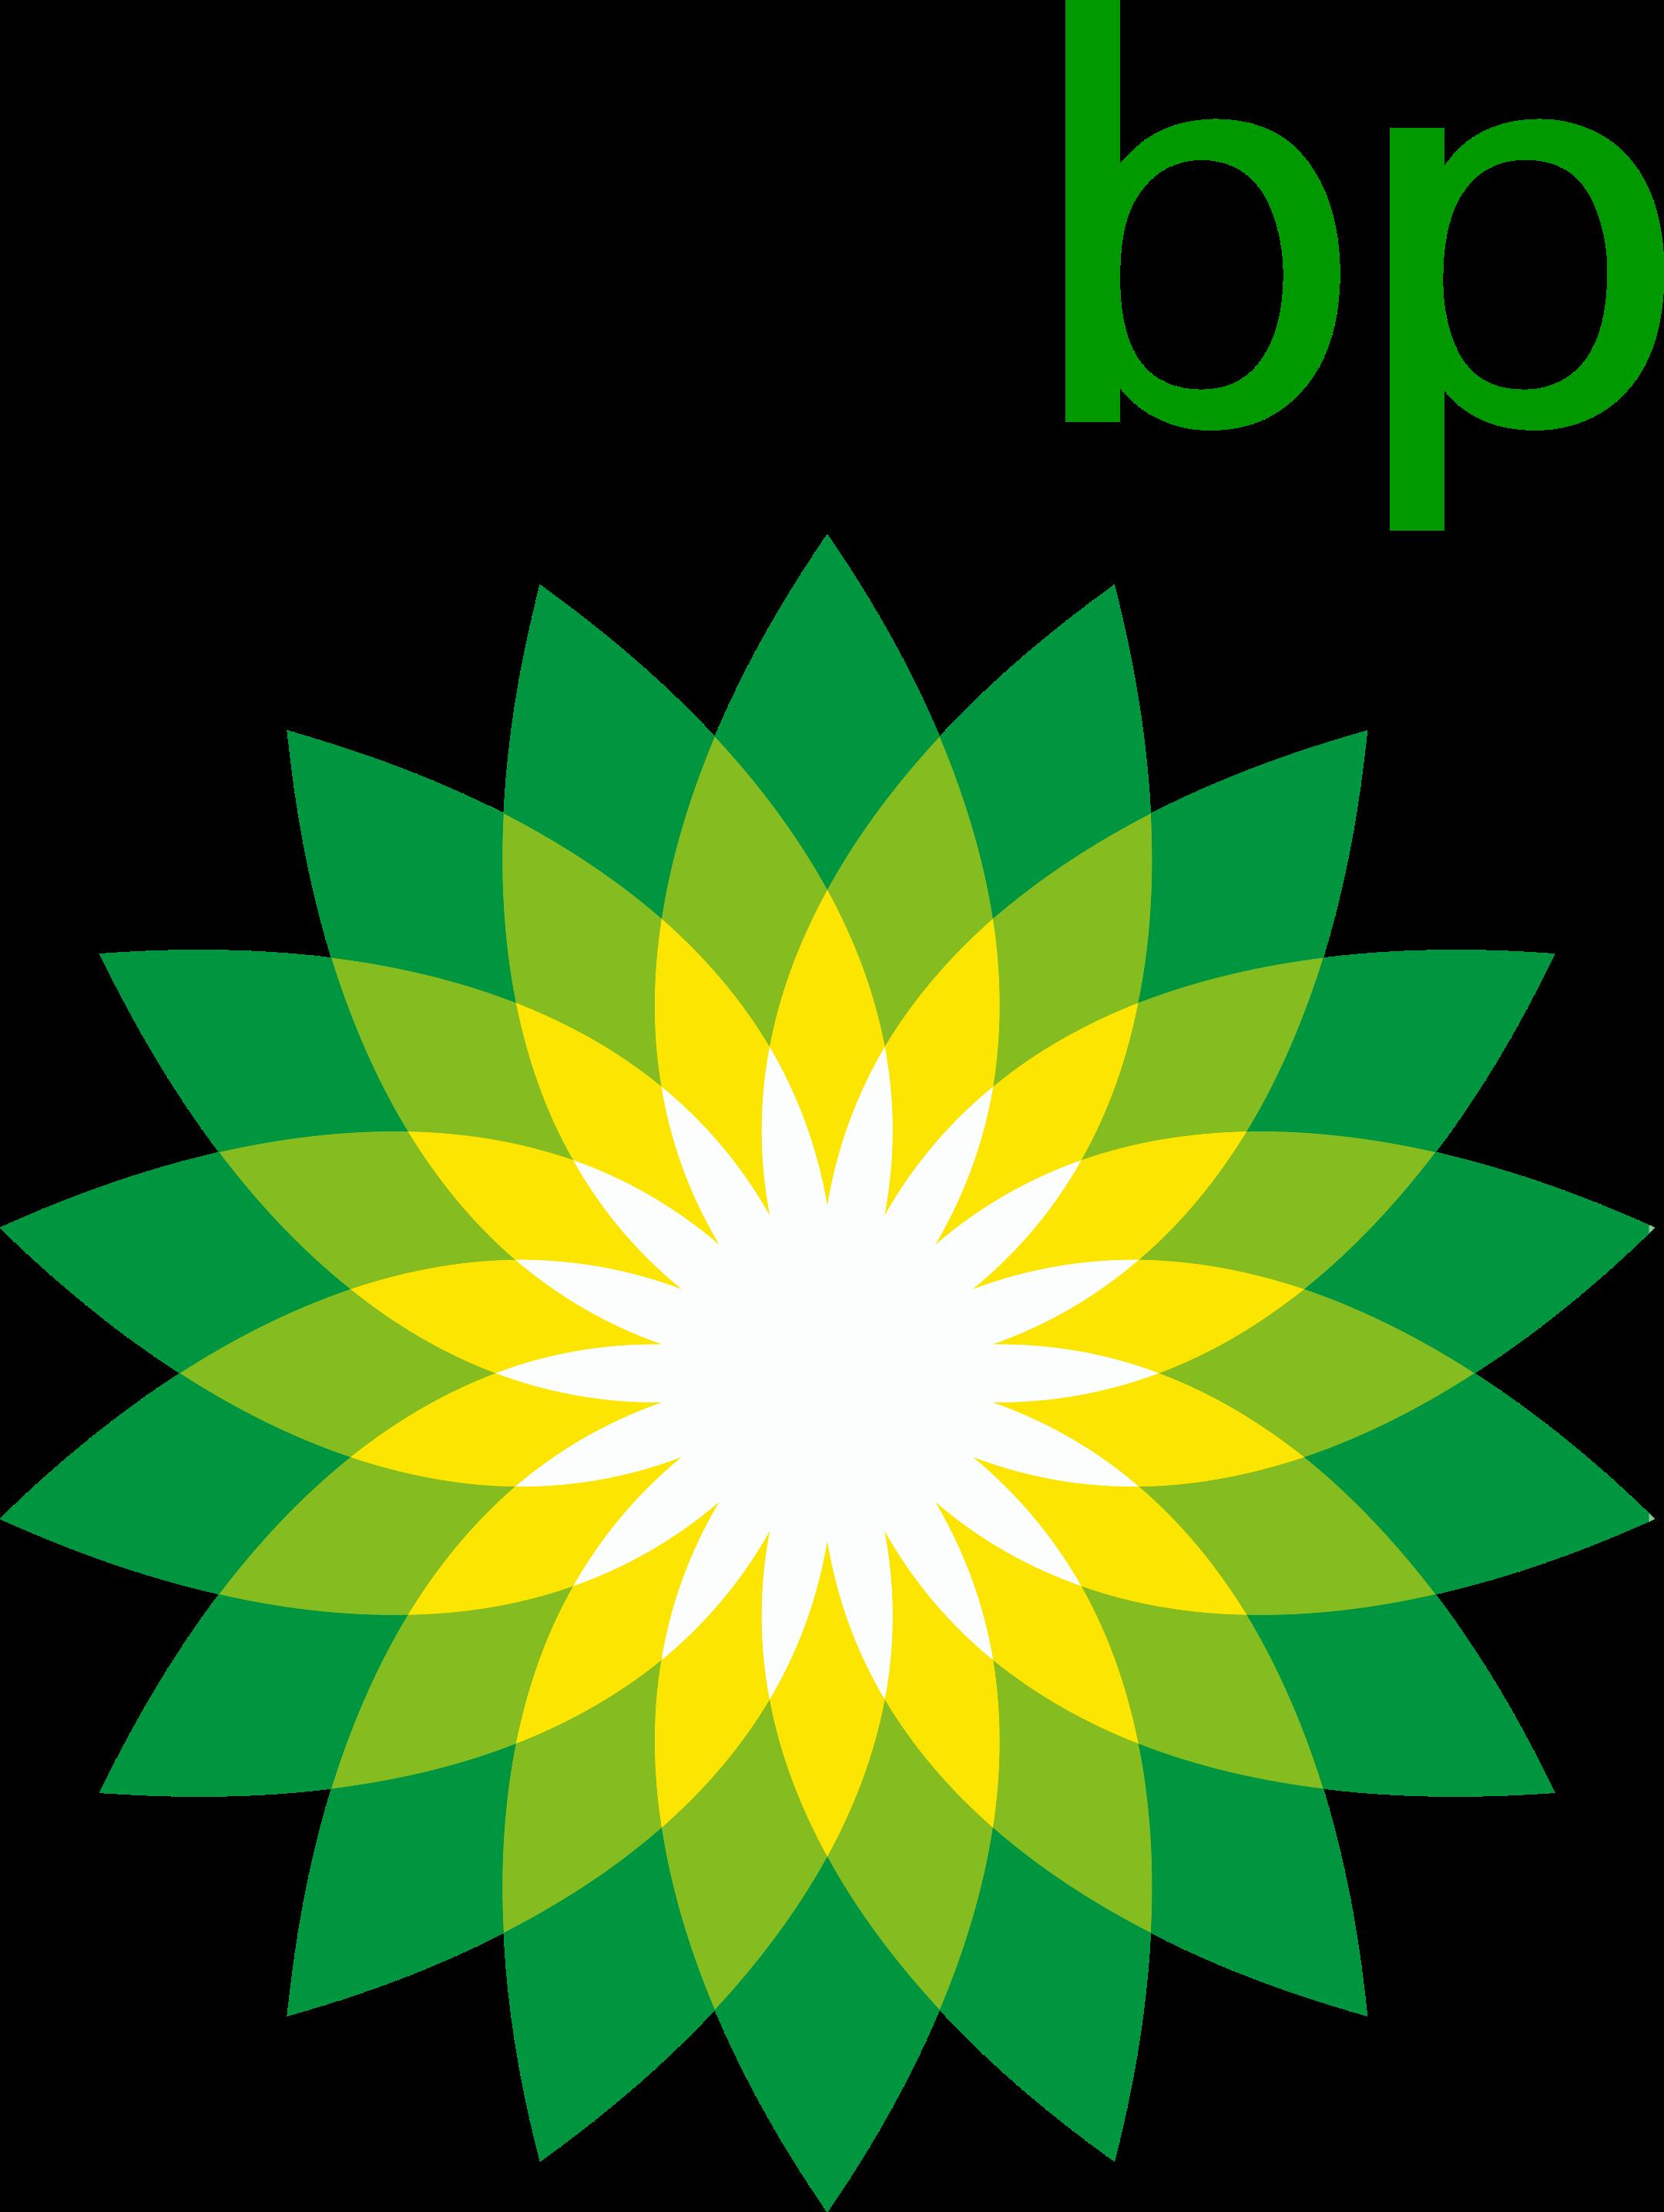 bp logo 2 - BP Logo